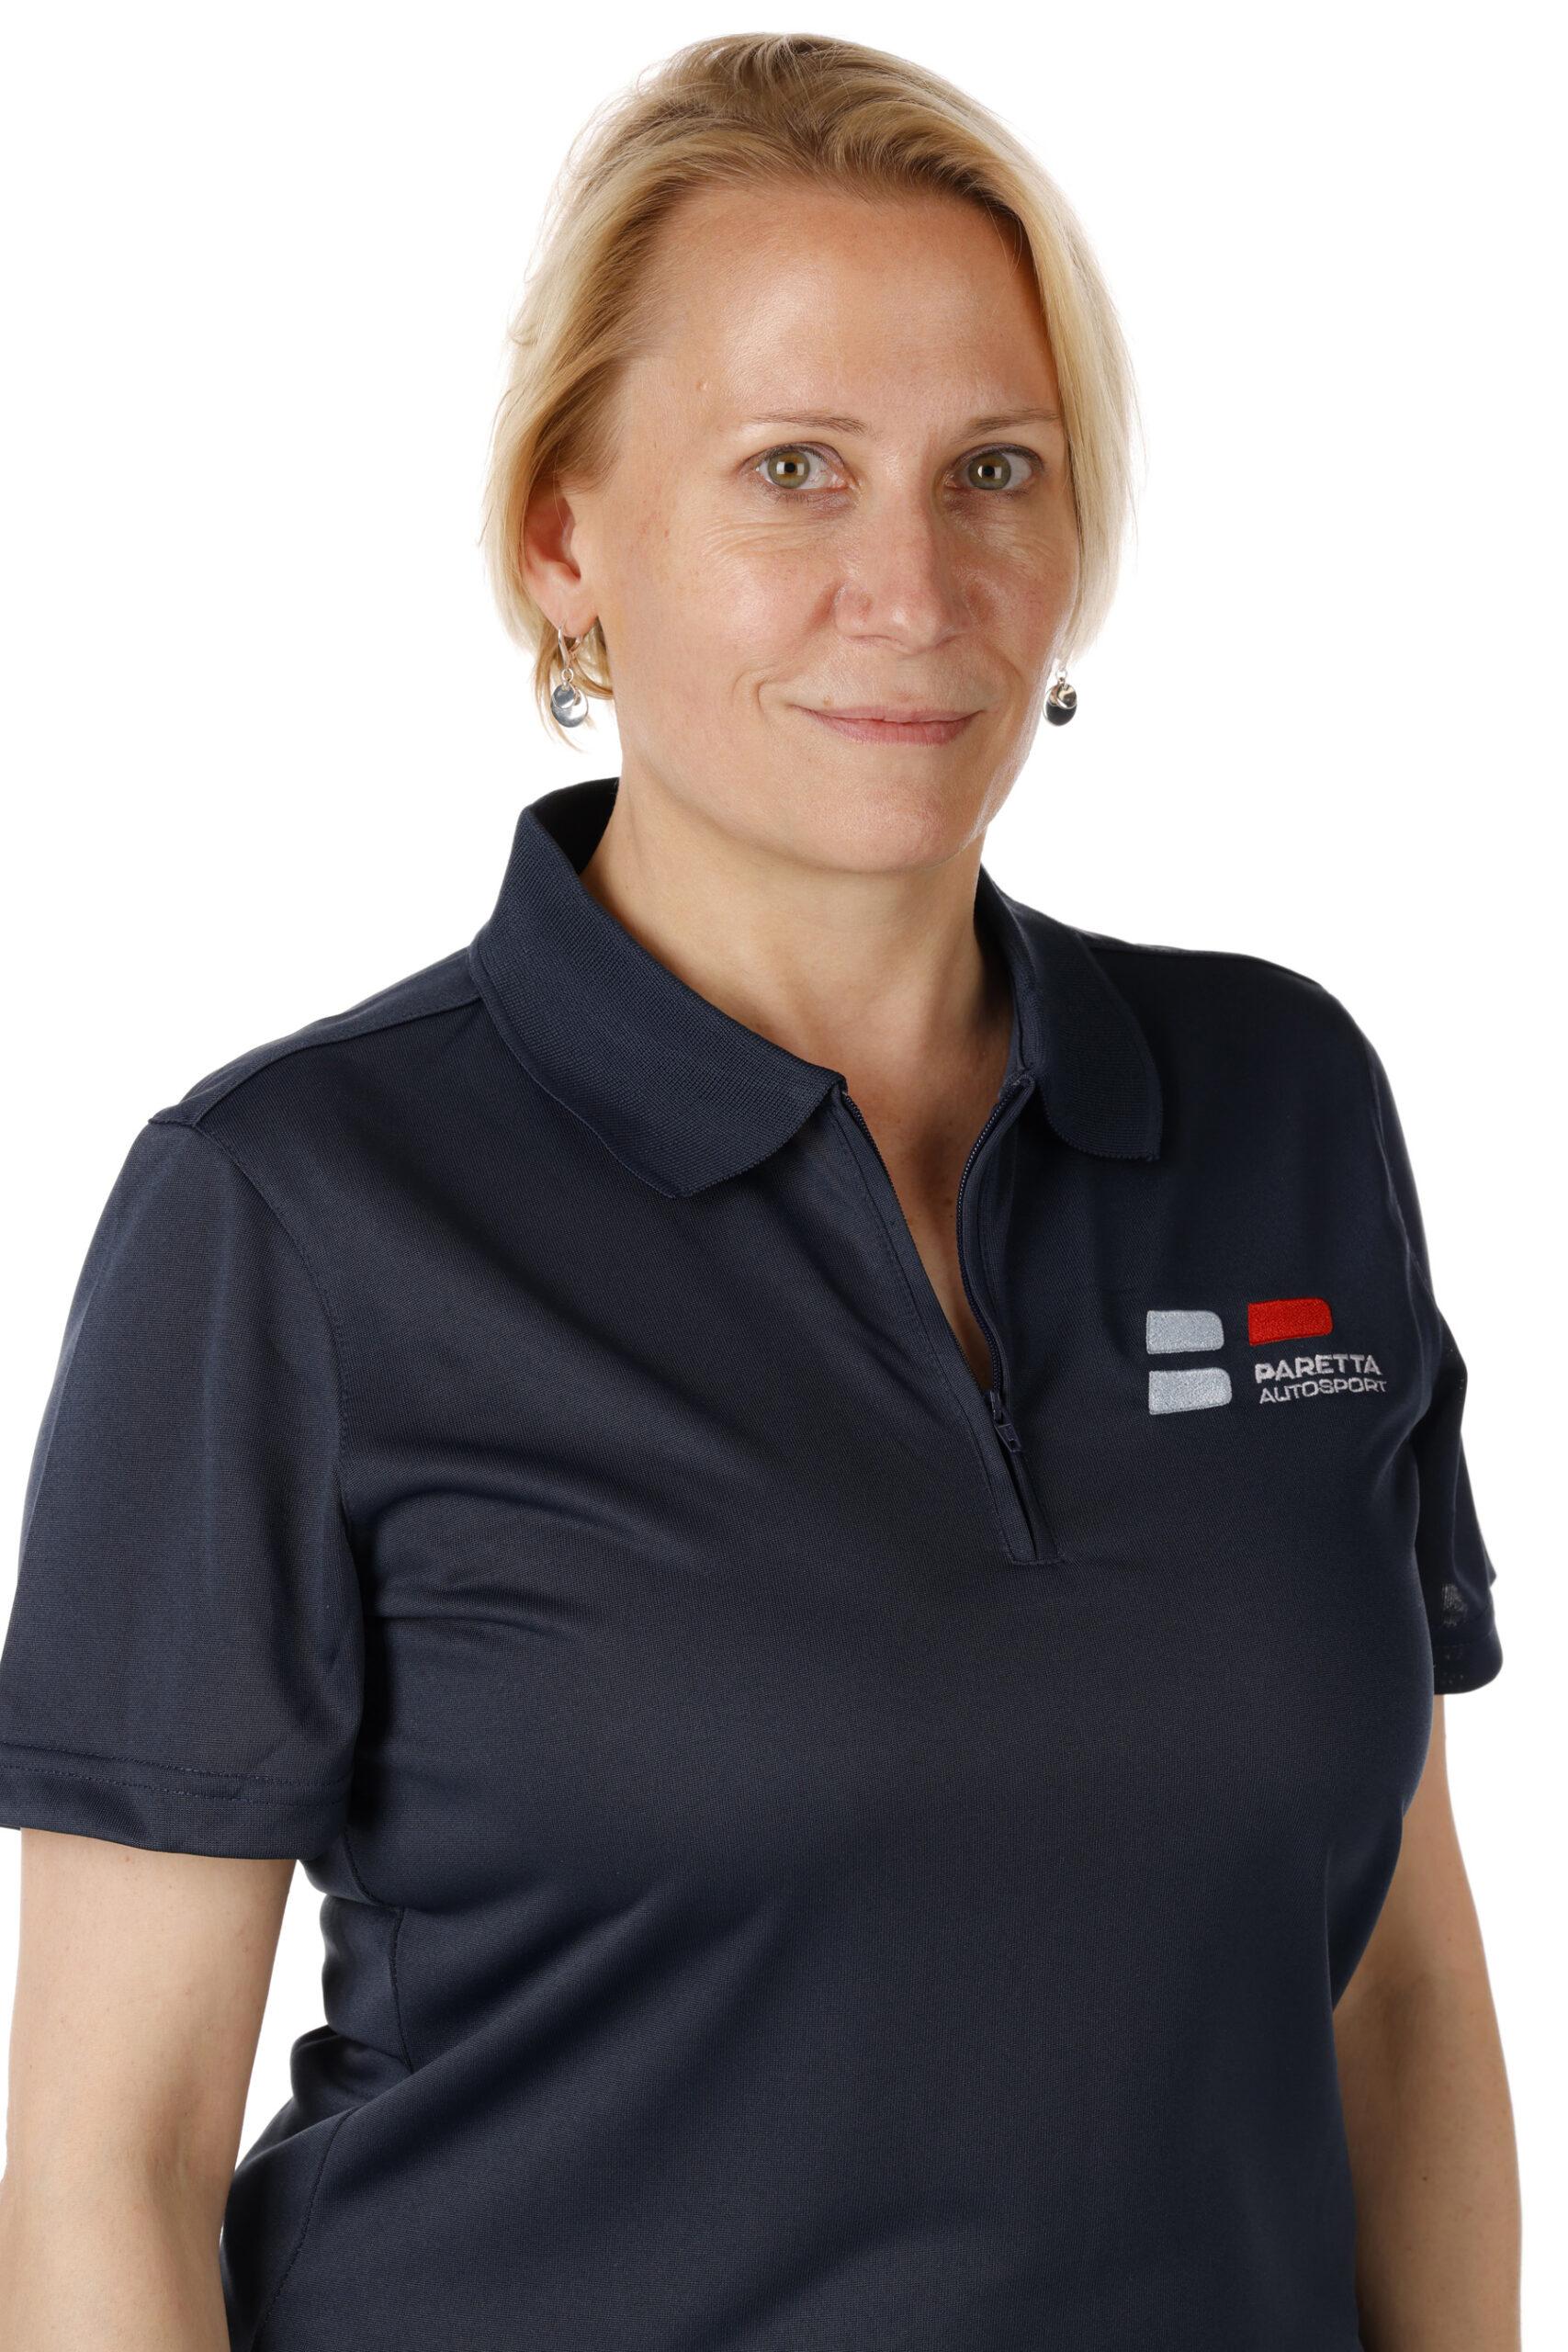 Beth Paretta - Guest, Owner, Paretta Autosport